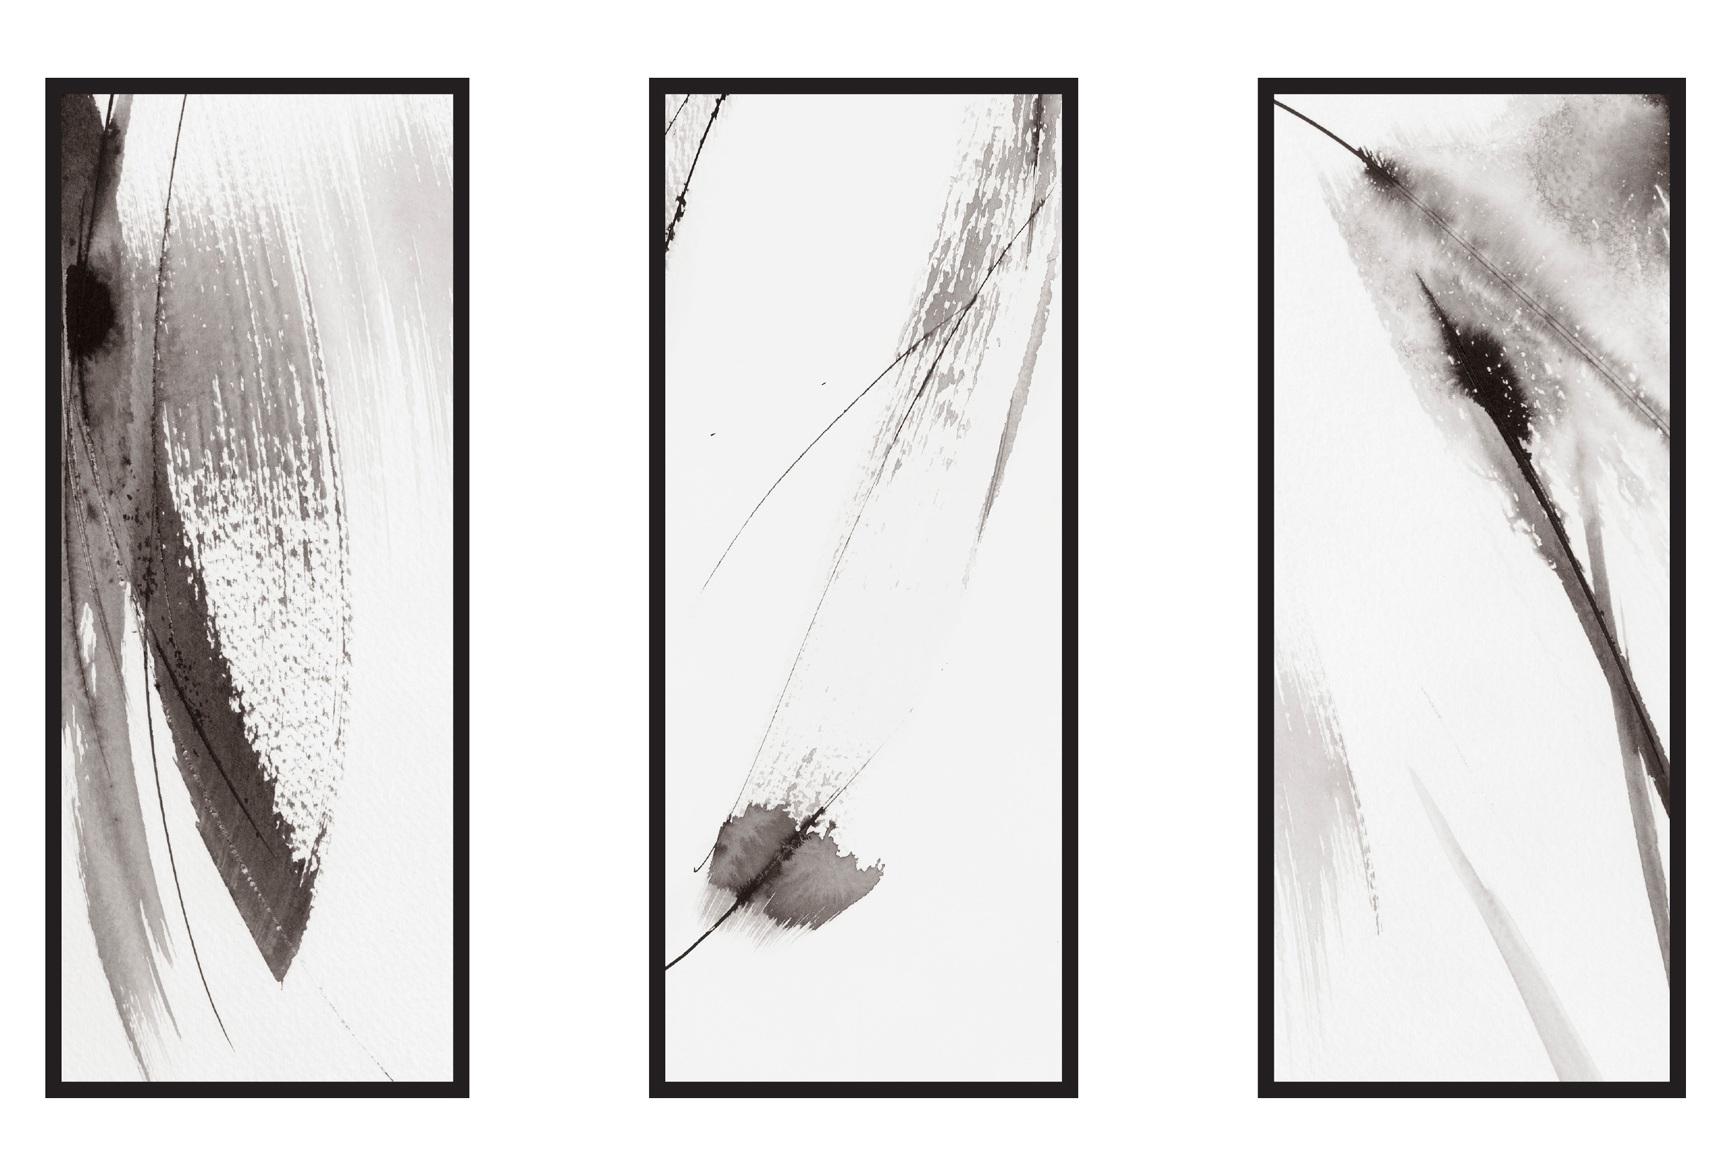 Dana Trijbetz, Sydney-based Artist - Abstract Collection 2018 - Ink Painting - 'Bask' Series.jpg